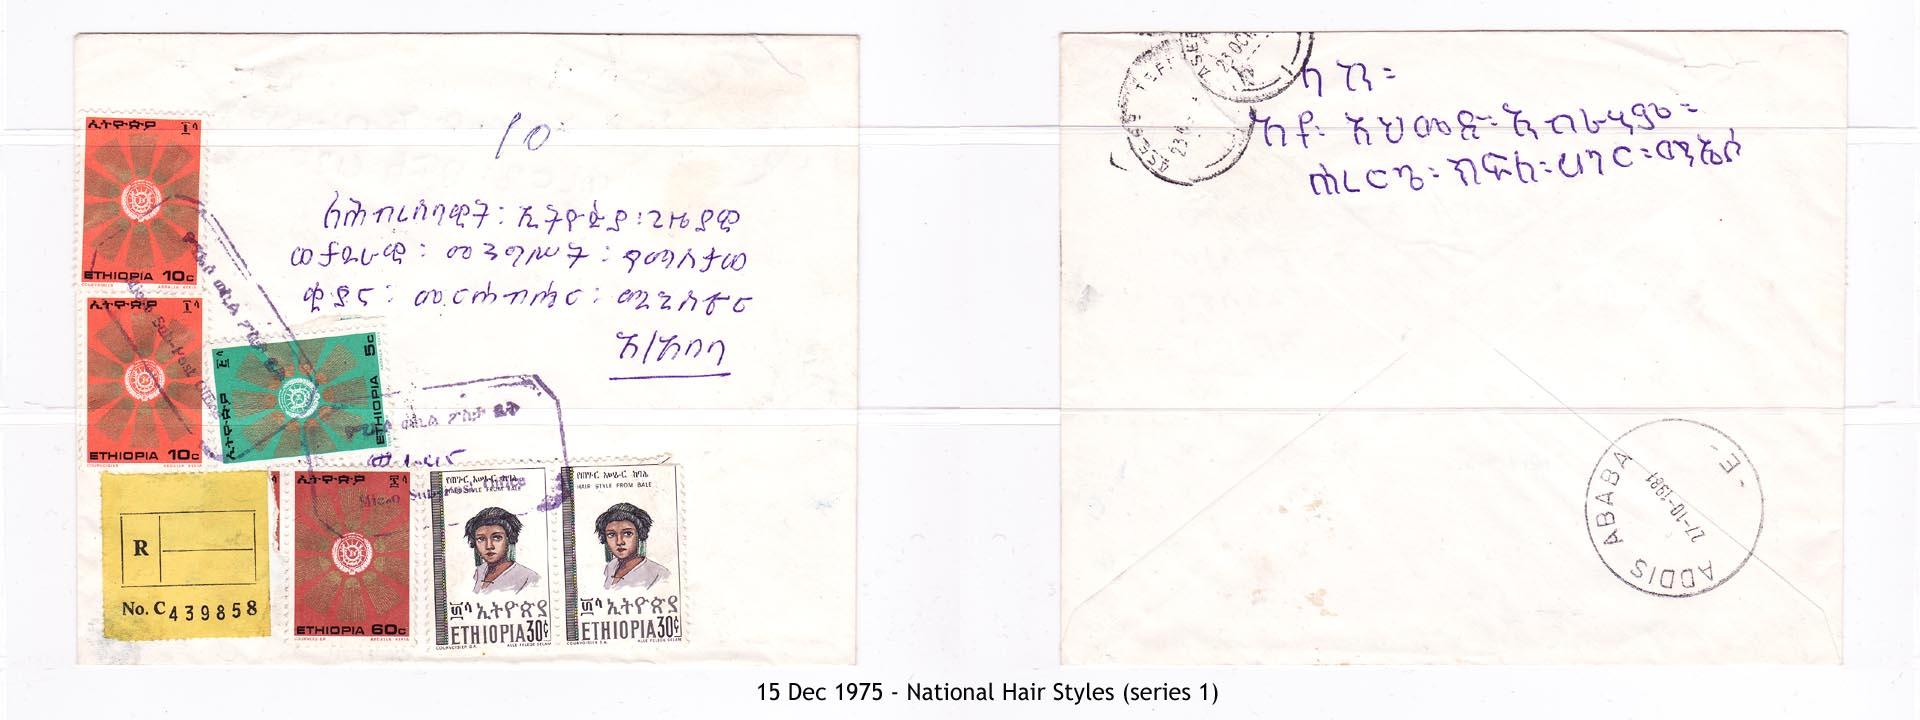 19751215 - National Hair Styles (series 1)